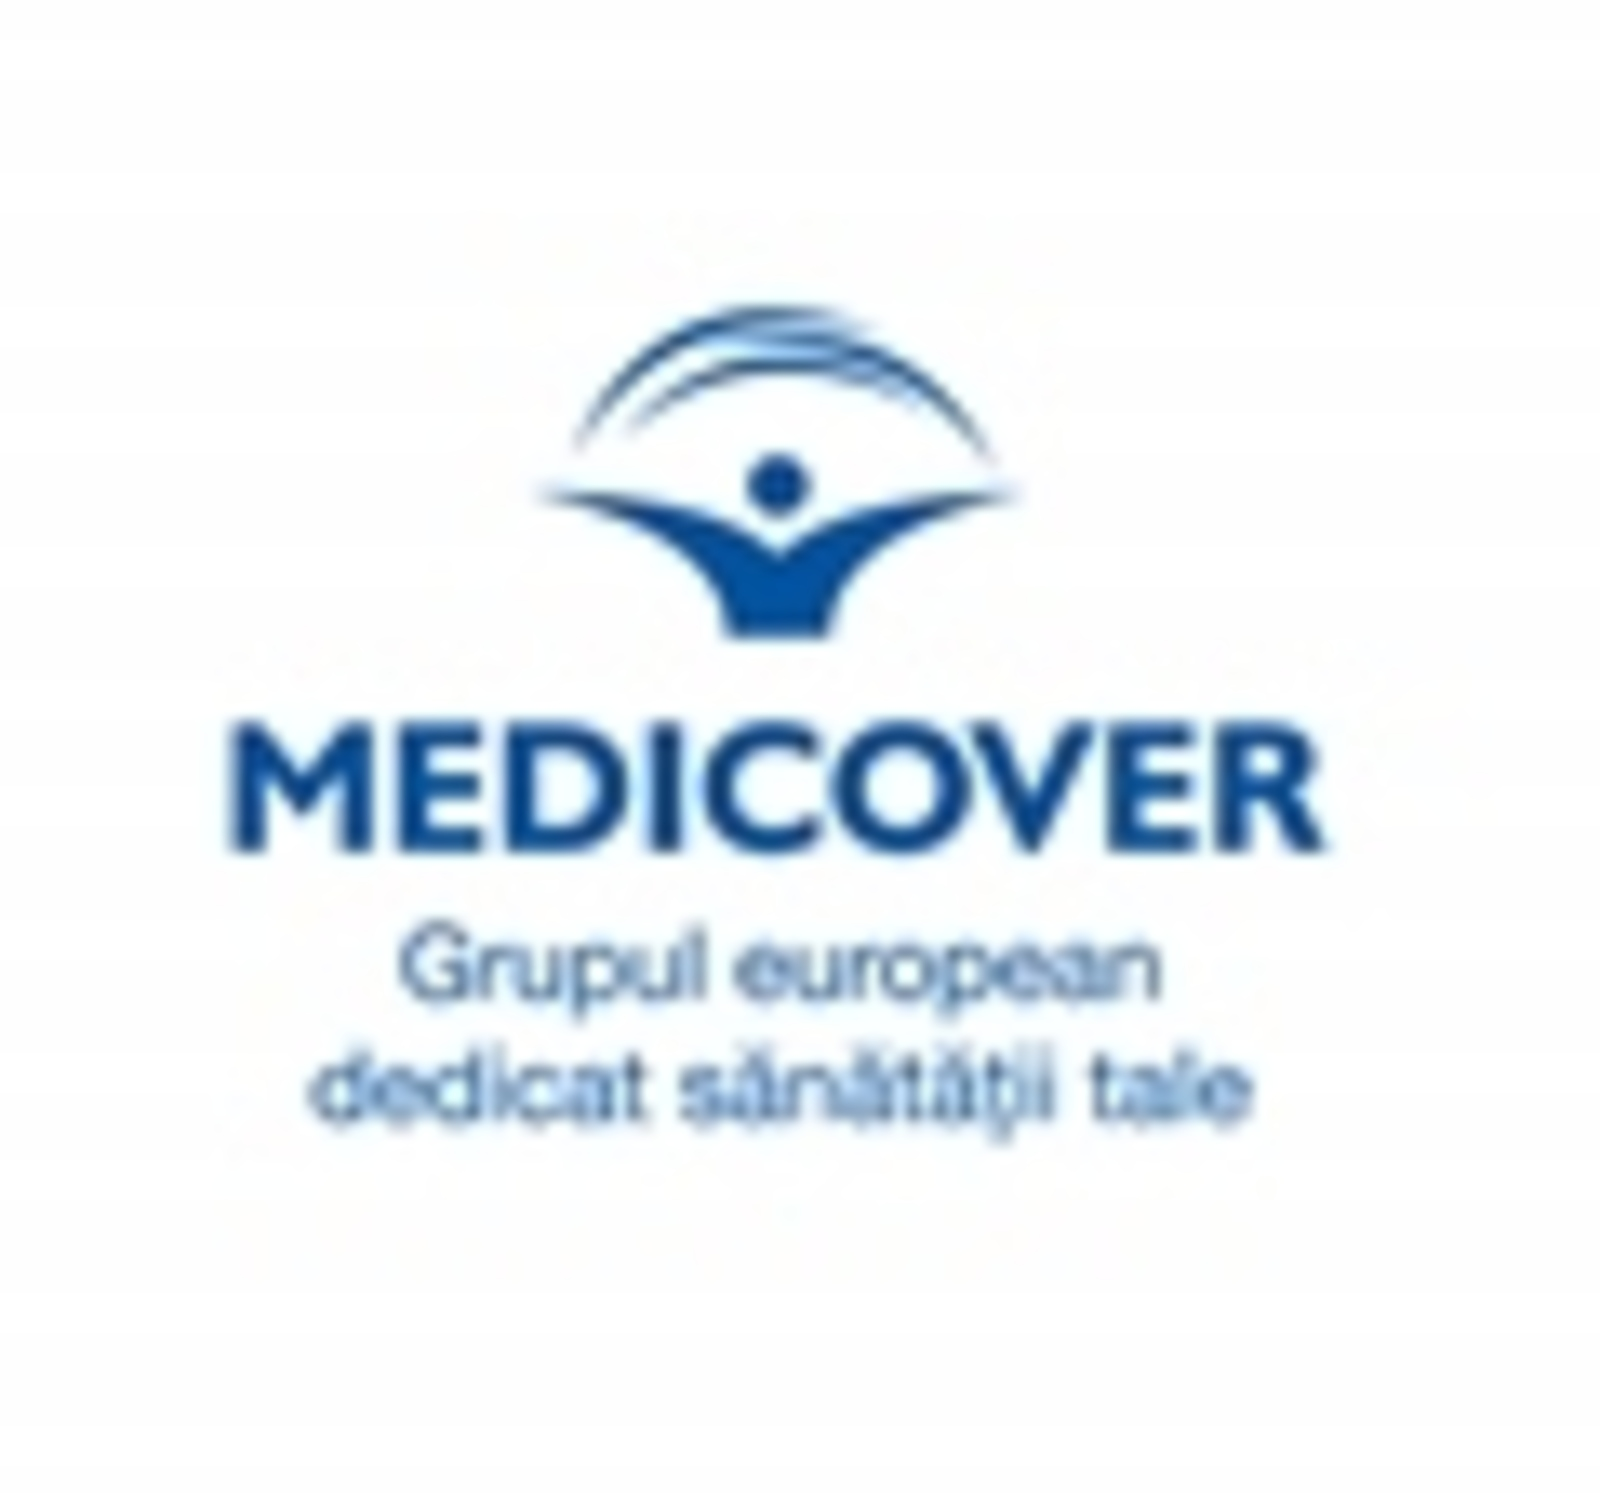 logo vertical Medicover